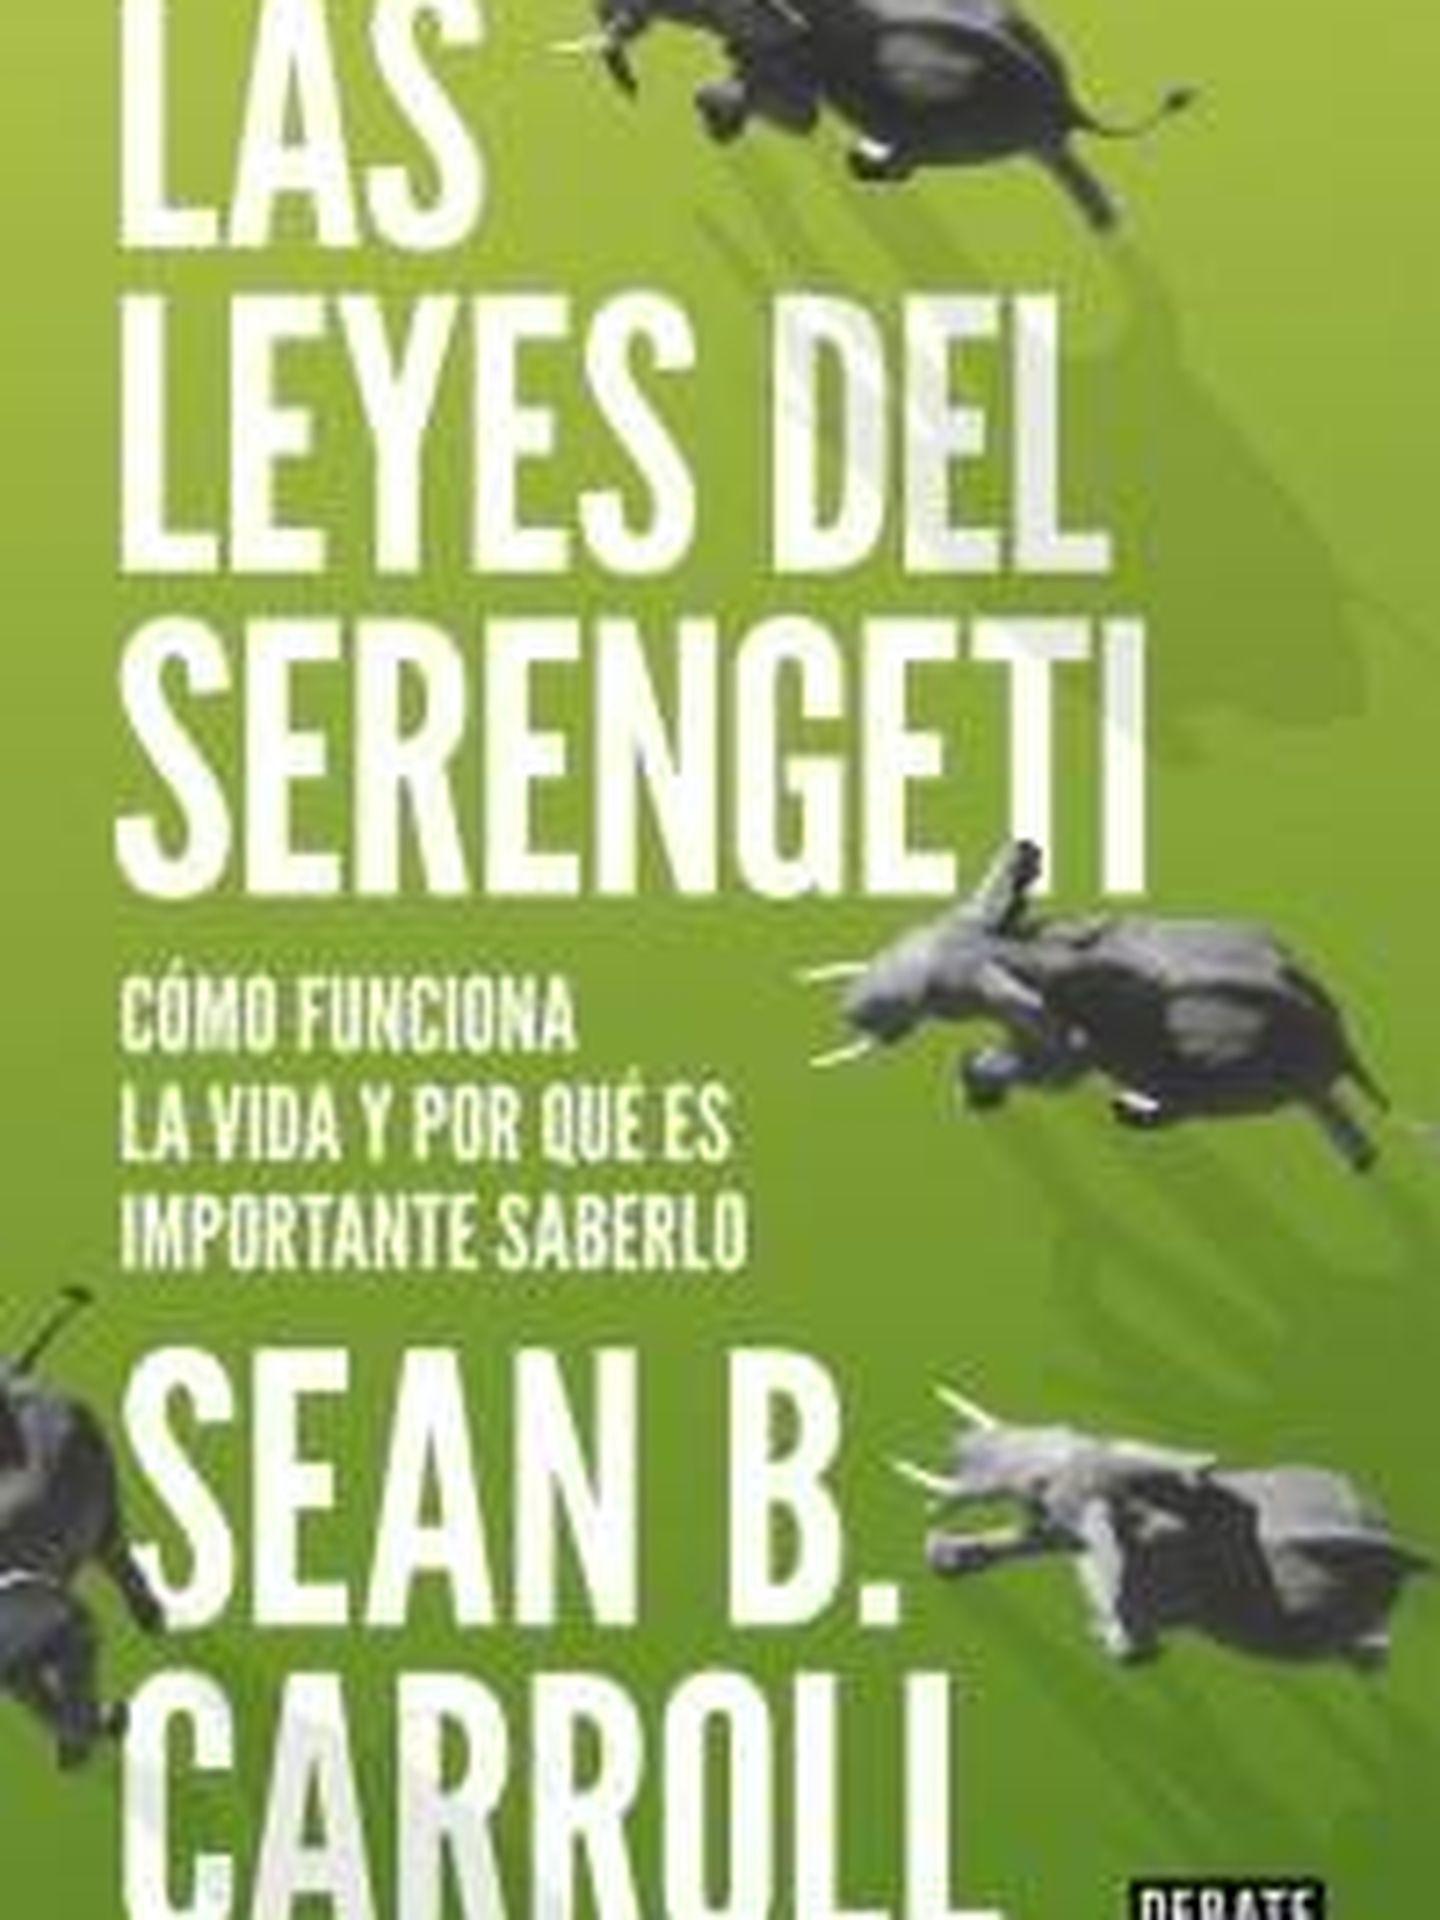 'Las leyes del Serengeti'. (Debate)